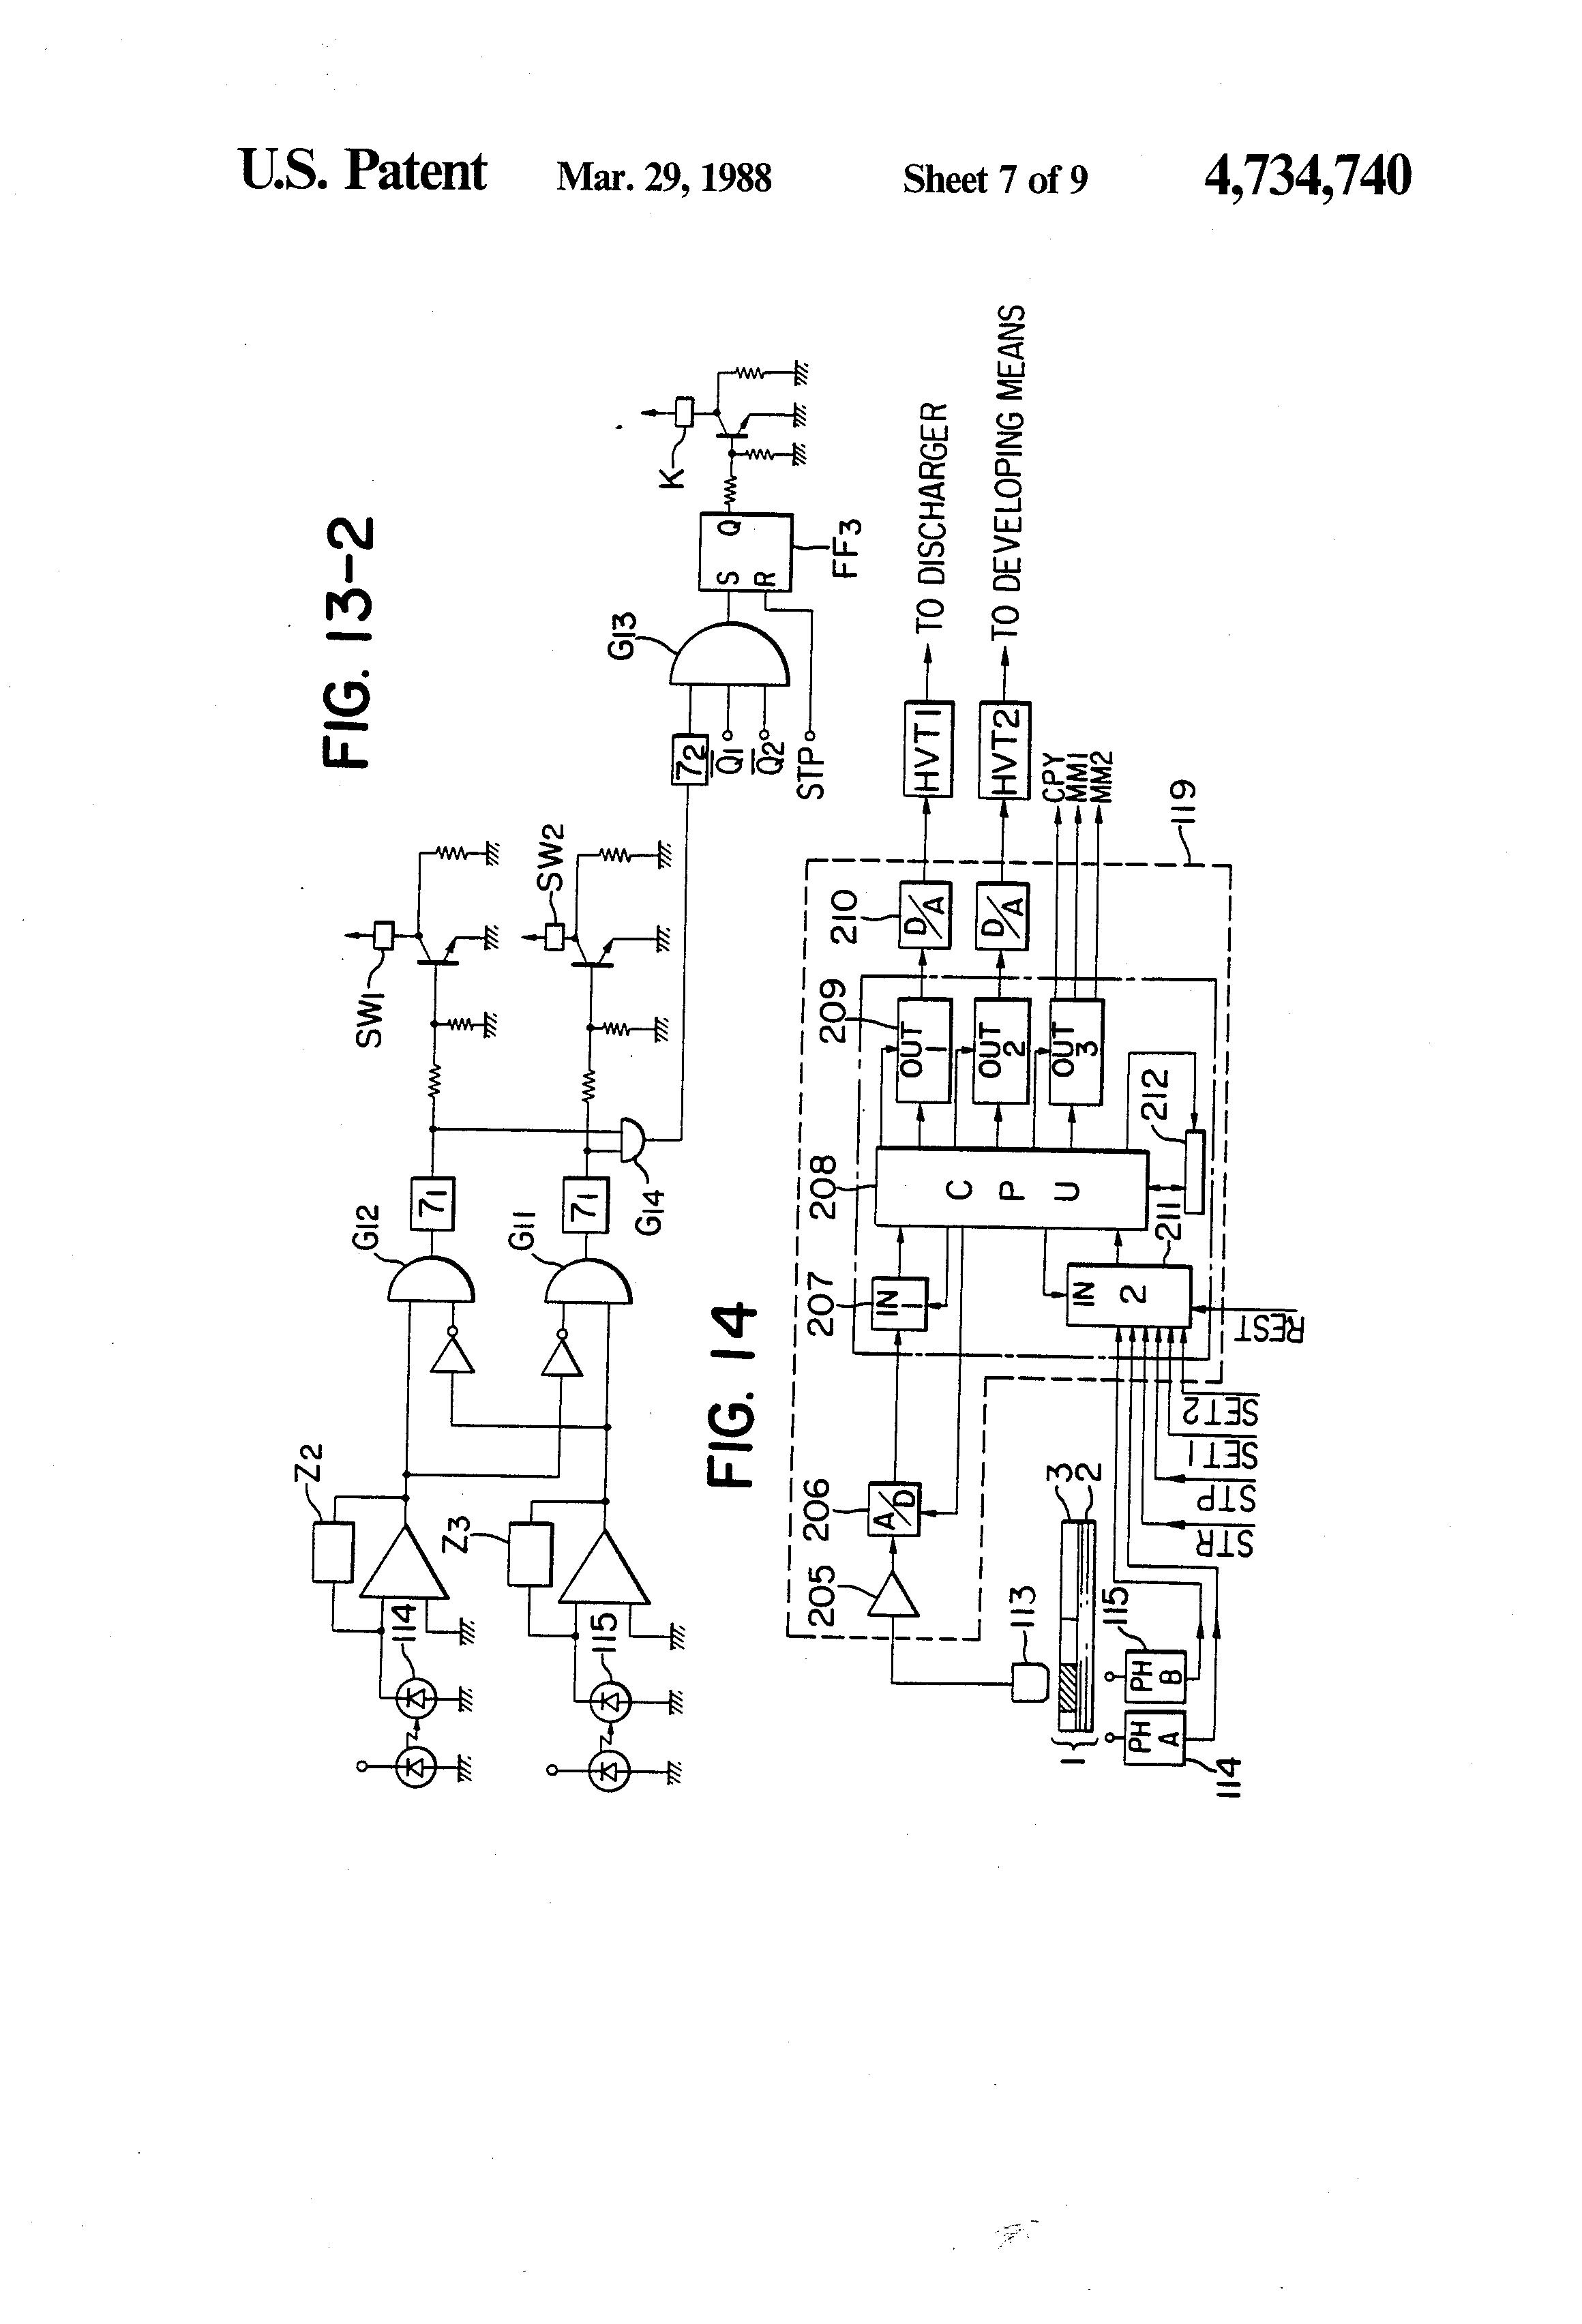 Wiring Diagram Moreover Ac Dual Capacitor Wiring Diagram Likewise Drum